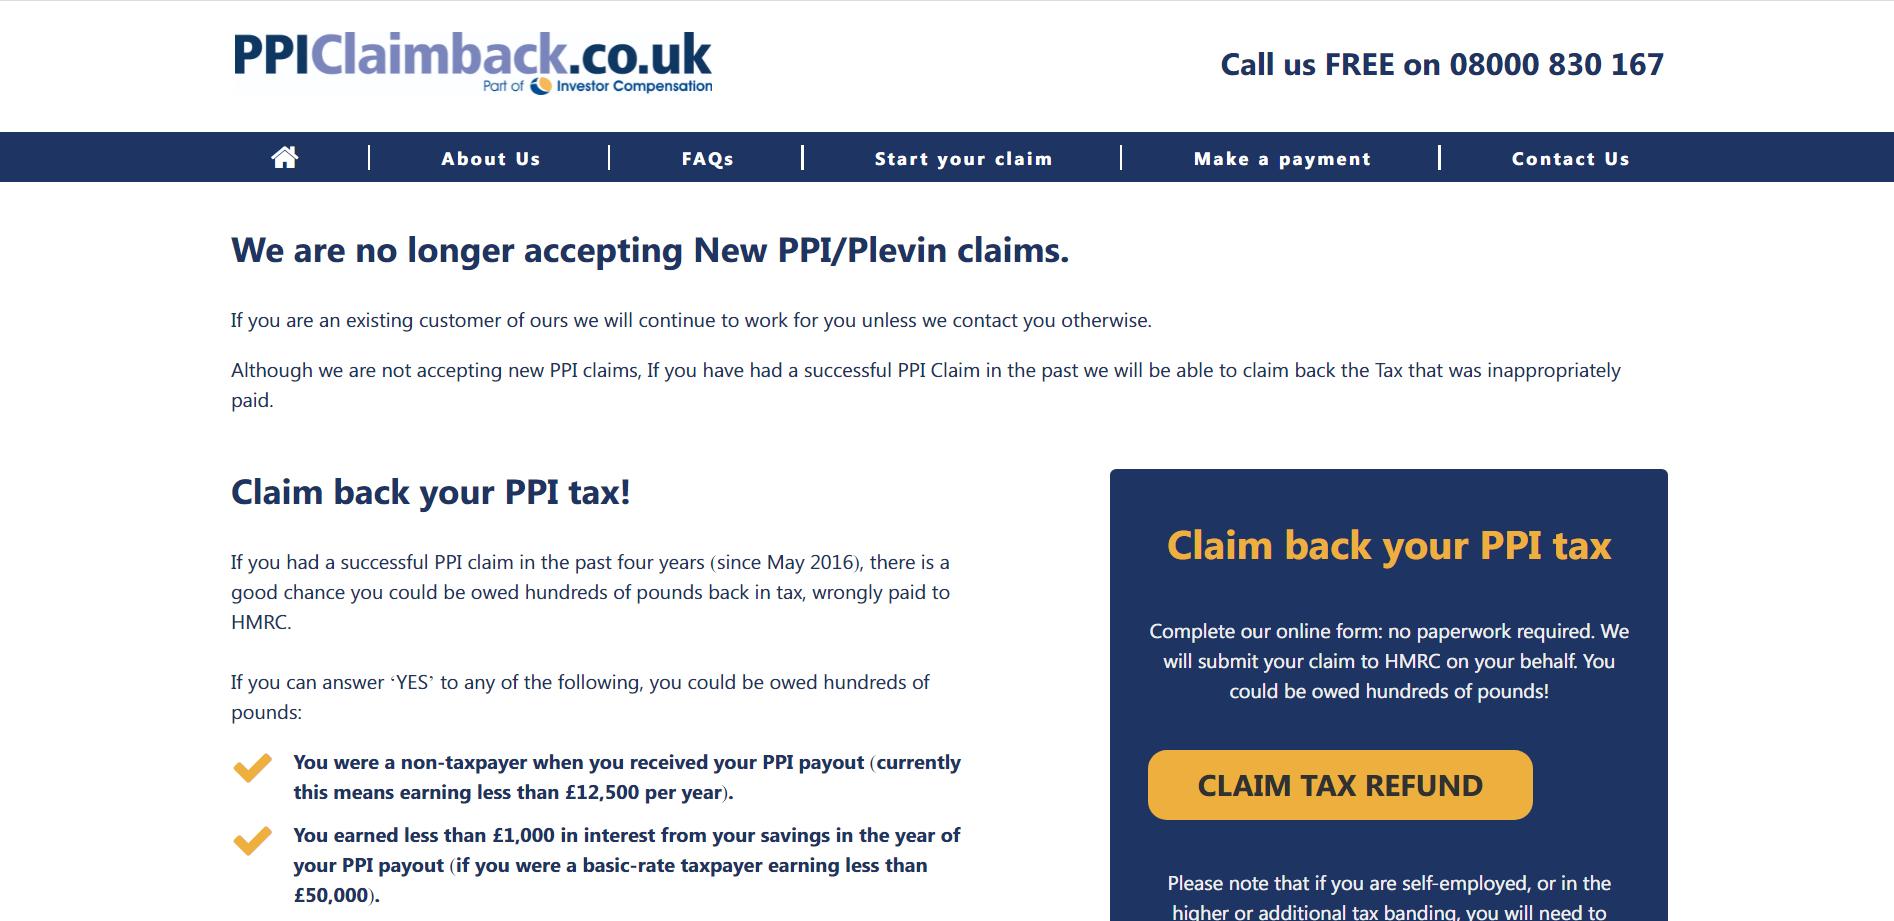 PPI Claim Back